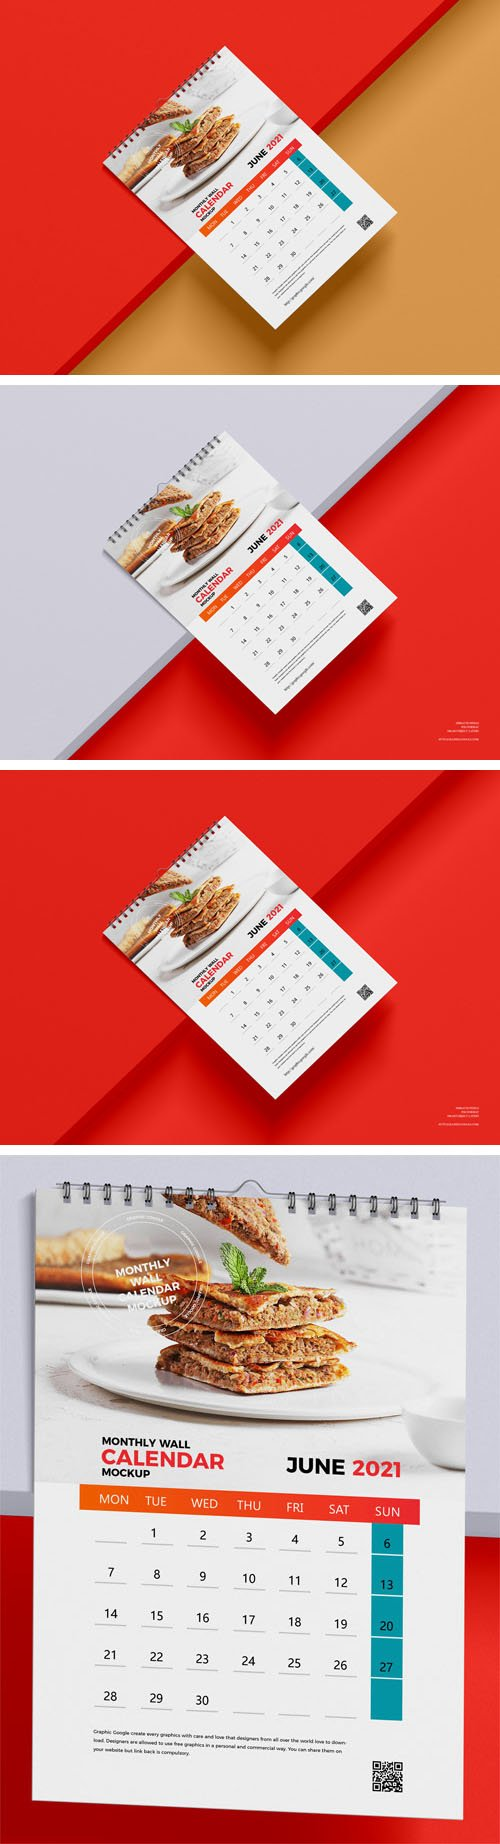 Monthly A3 Wall Calendar PSD Mockup Template